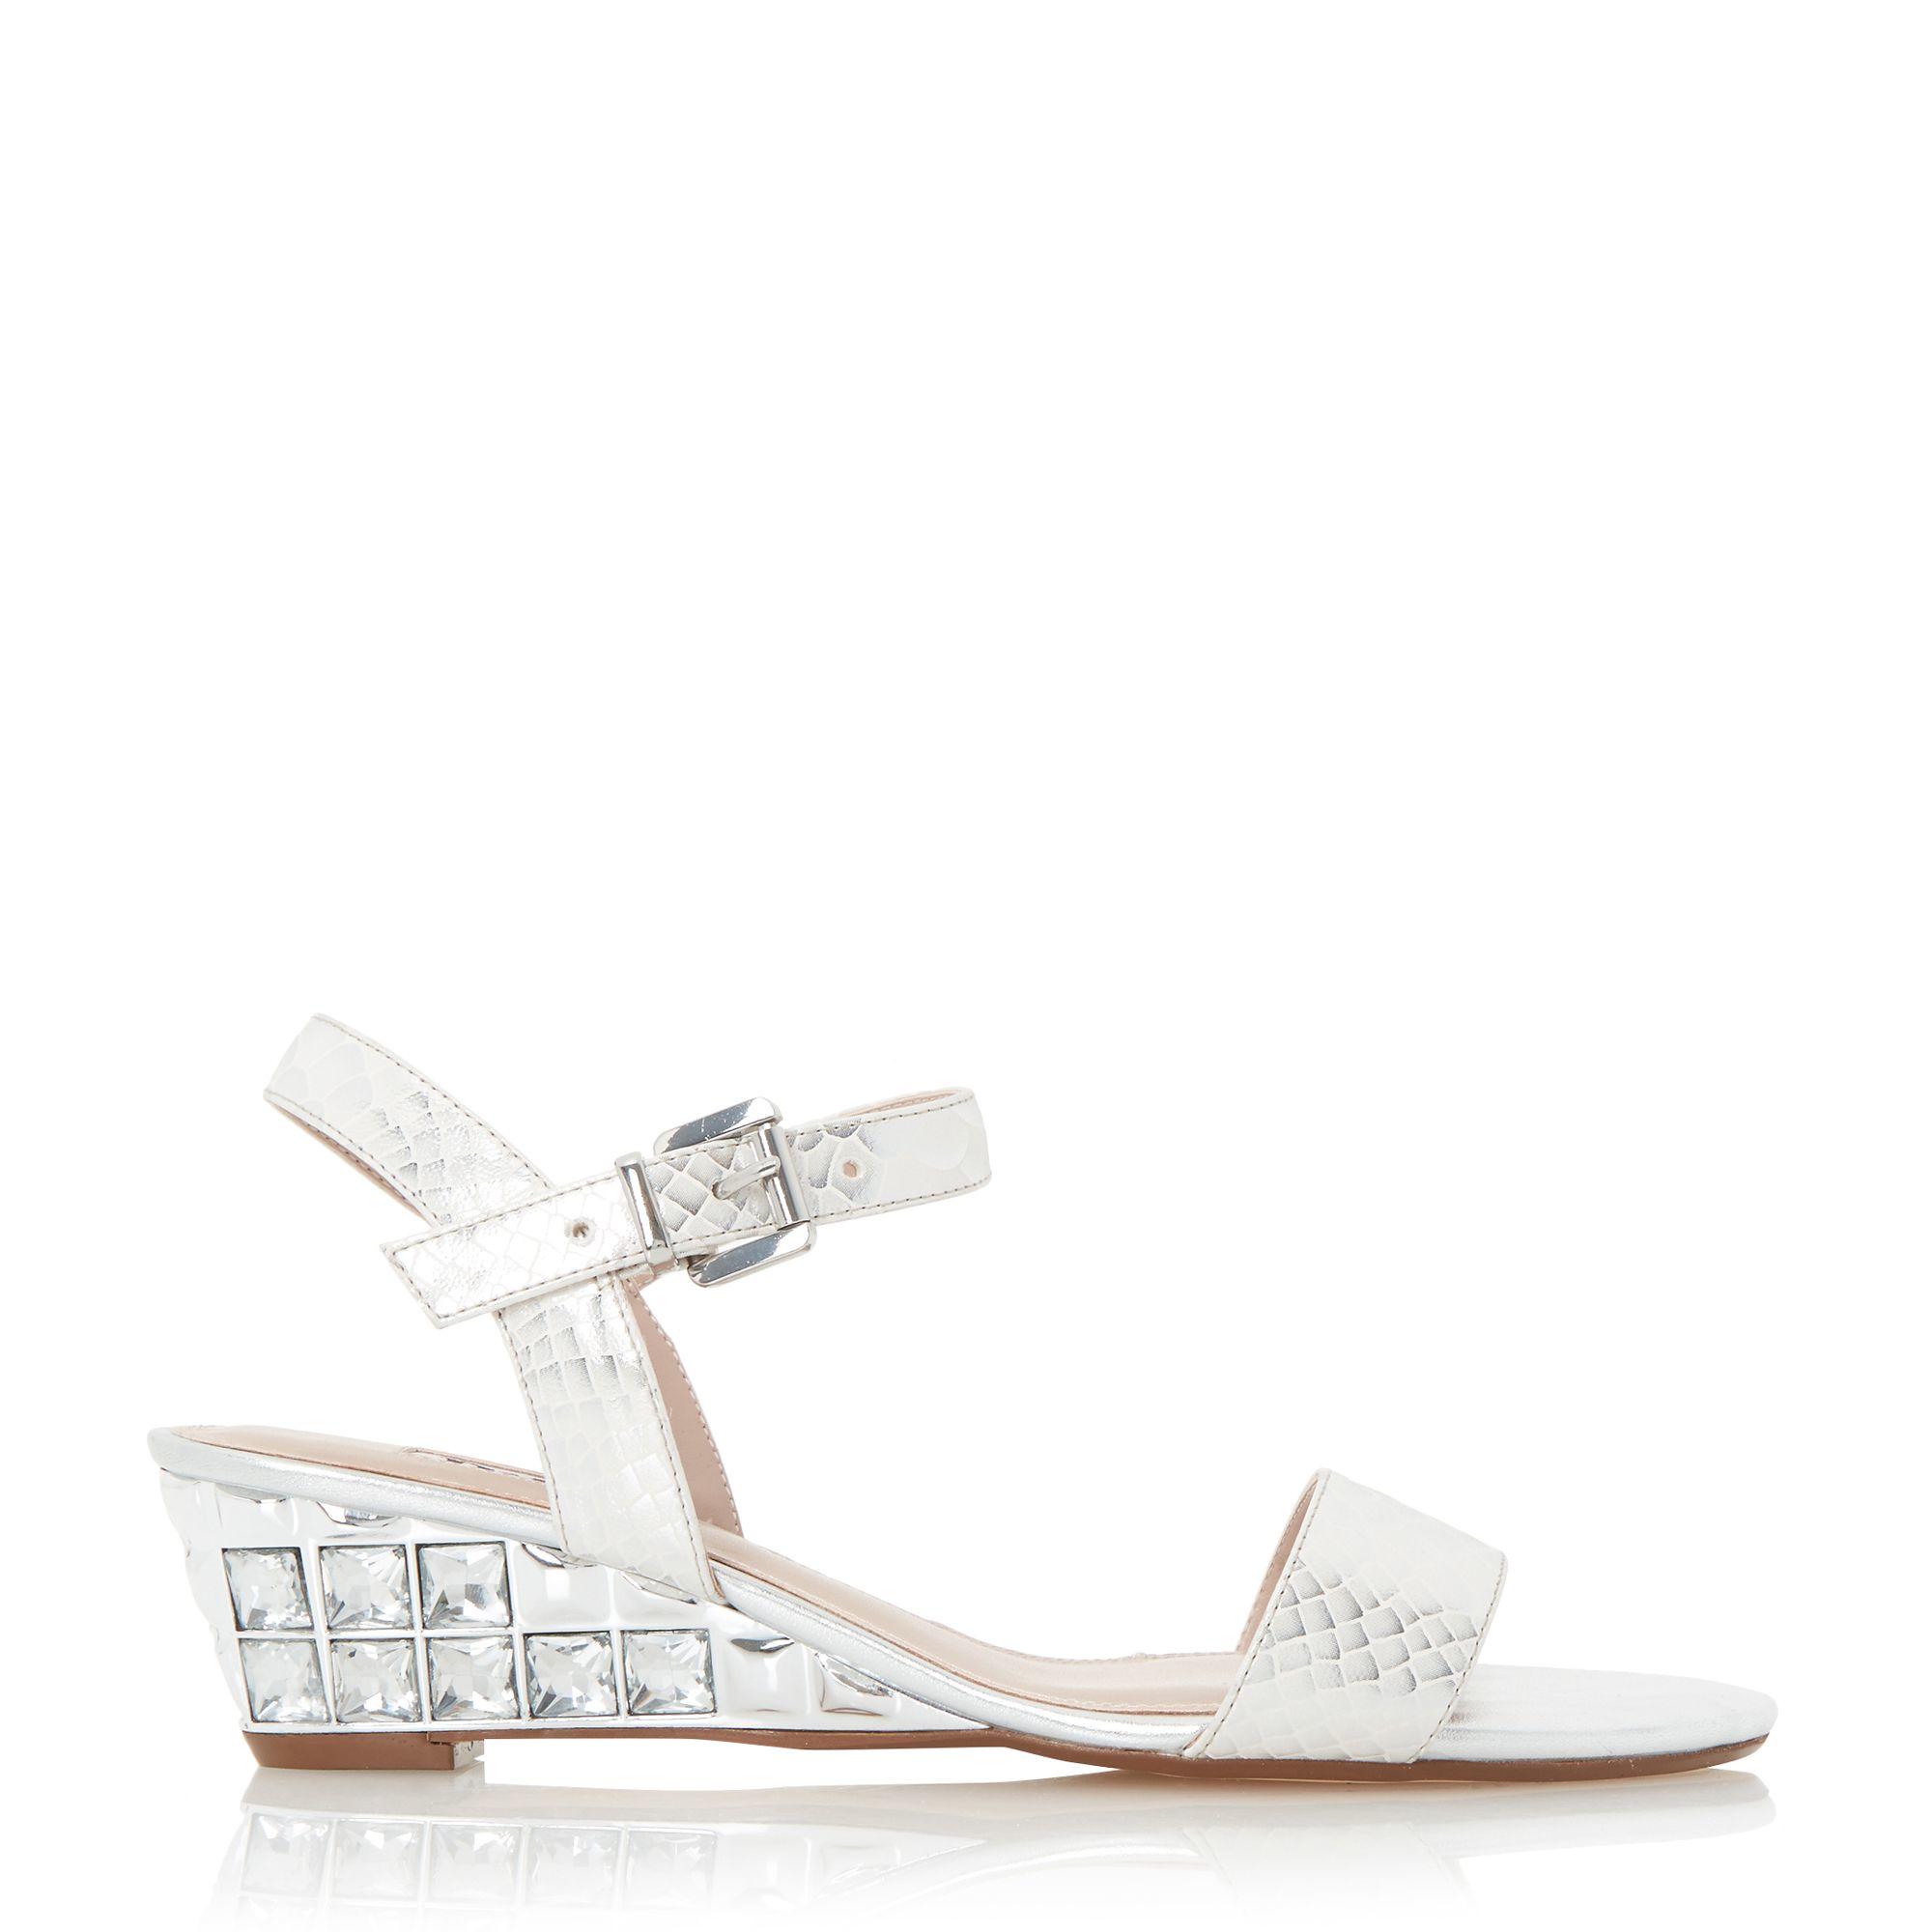 818d8129b96691 Dune Monaa Jewelled Wedge Sandals in White - Lyst